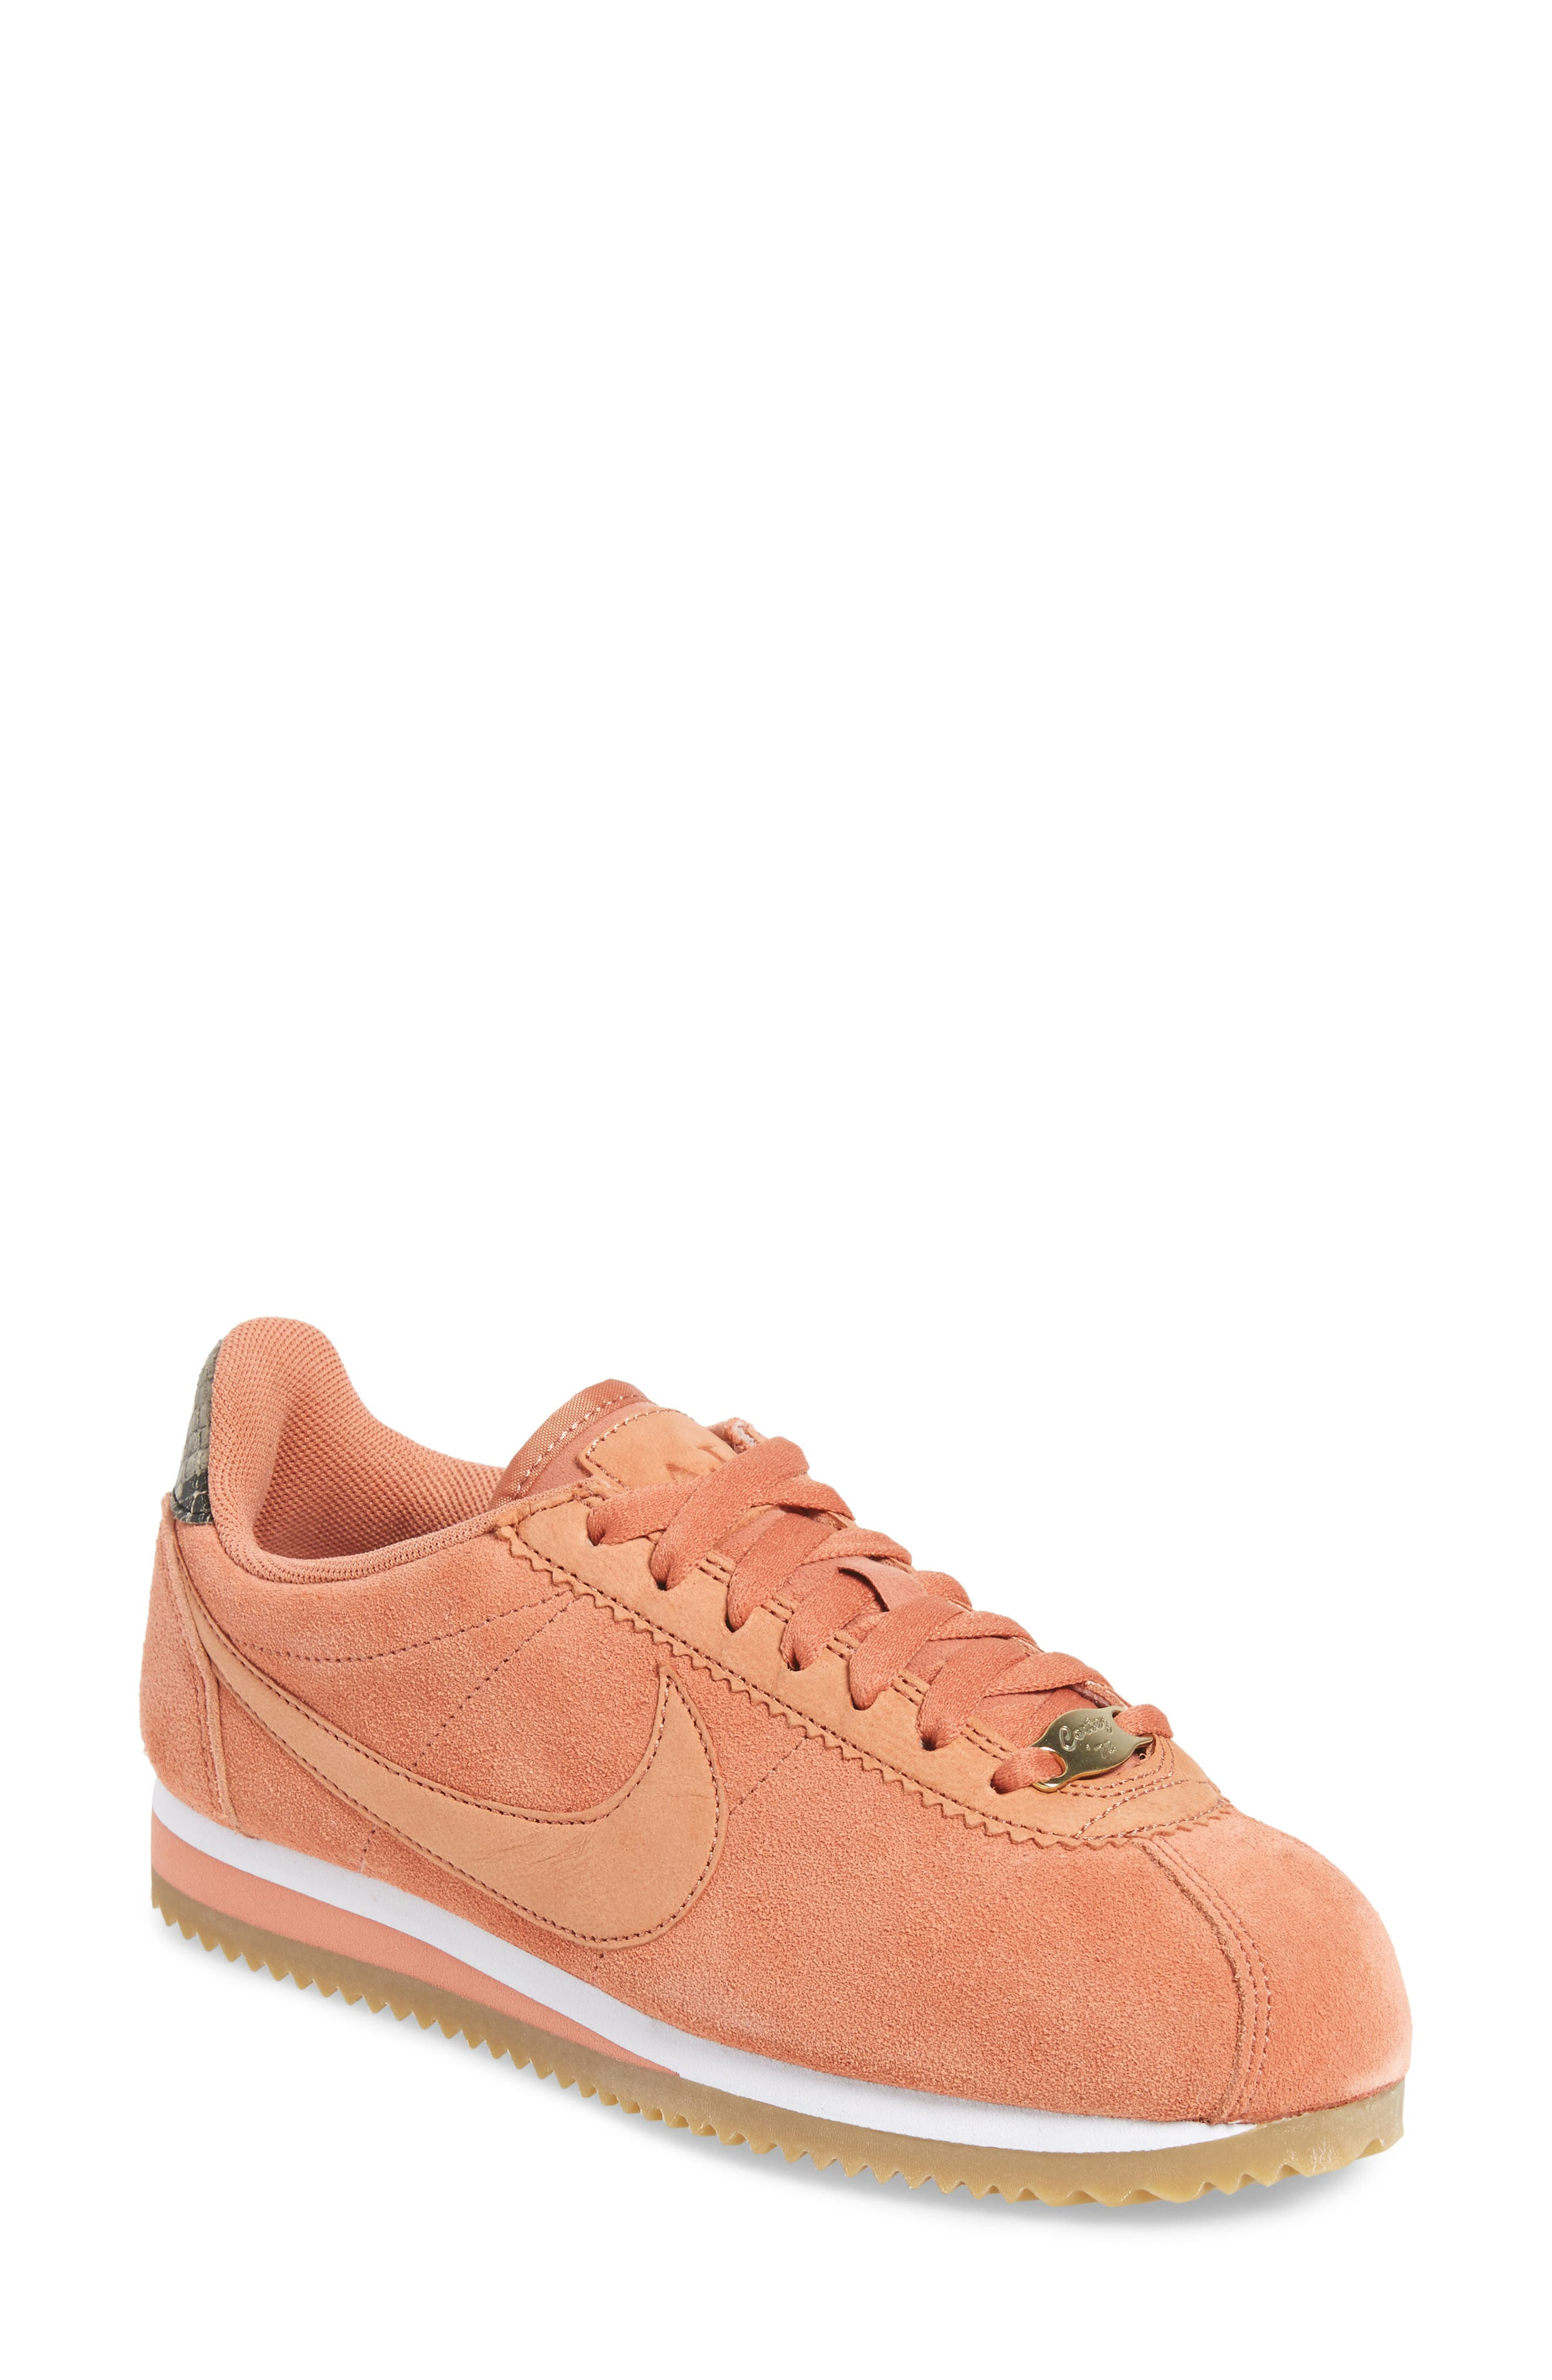 Main Image - Nike x A.L.C. Classic Cortez Sneaker (Women)